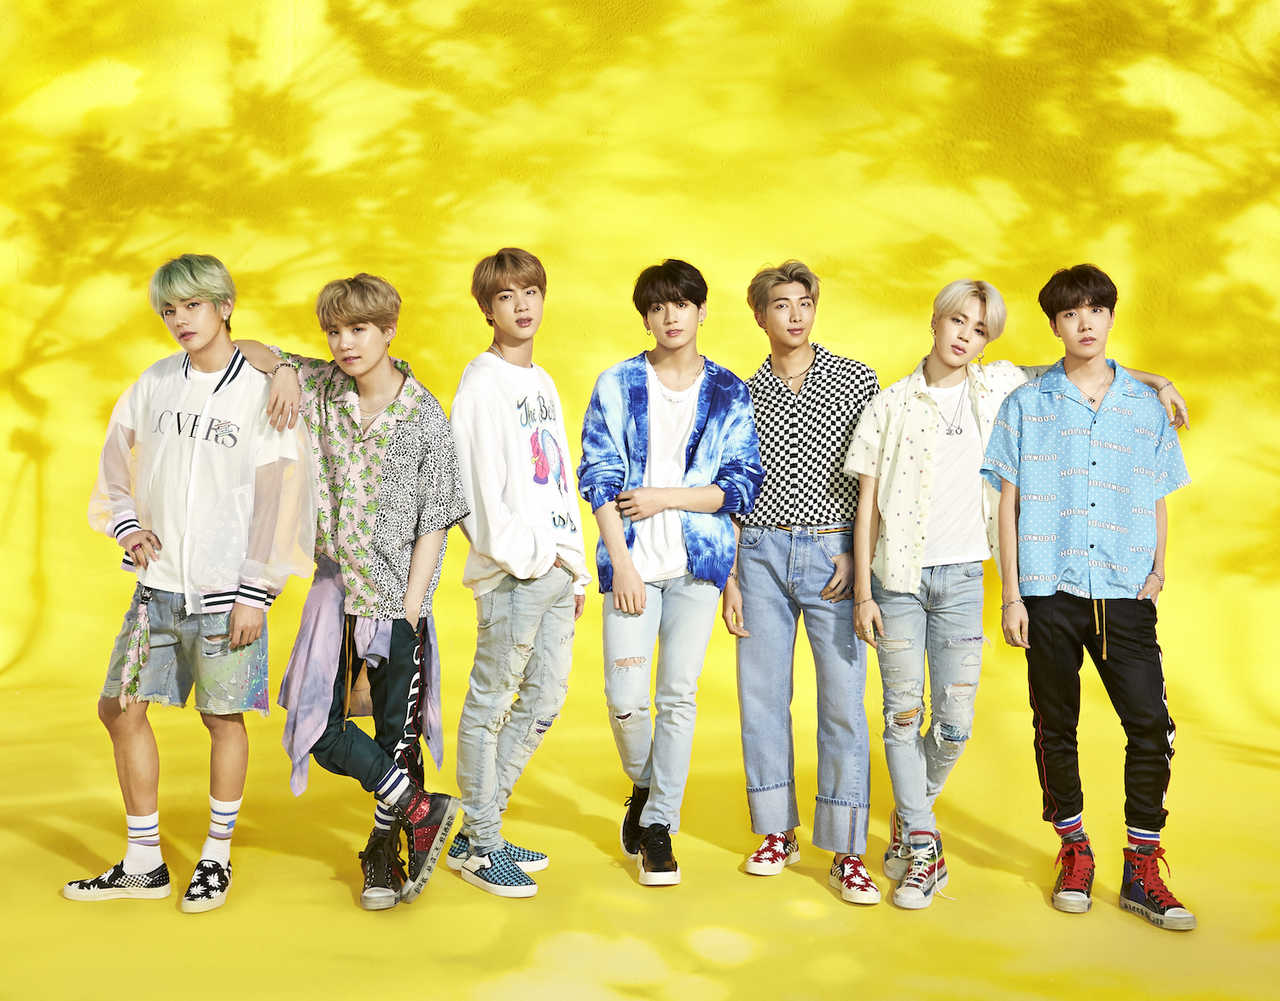 BTS「Airplane pt.2 -Japanese ver.-」MVが海外男性アーティストの日本語verビデオ初の1億再生突破!